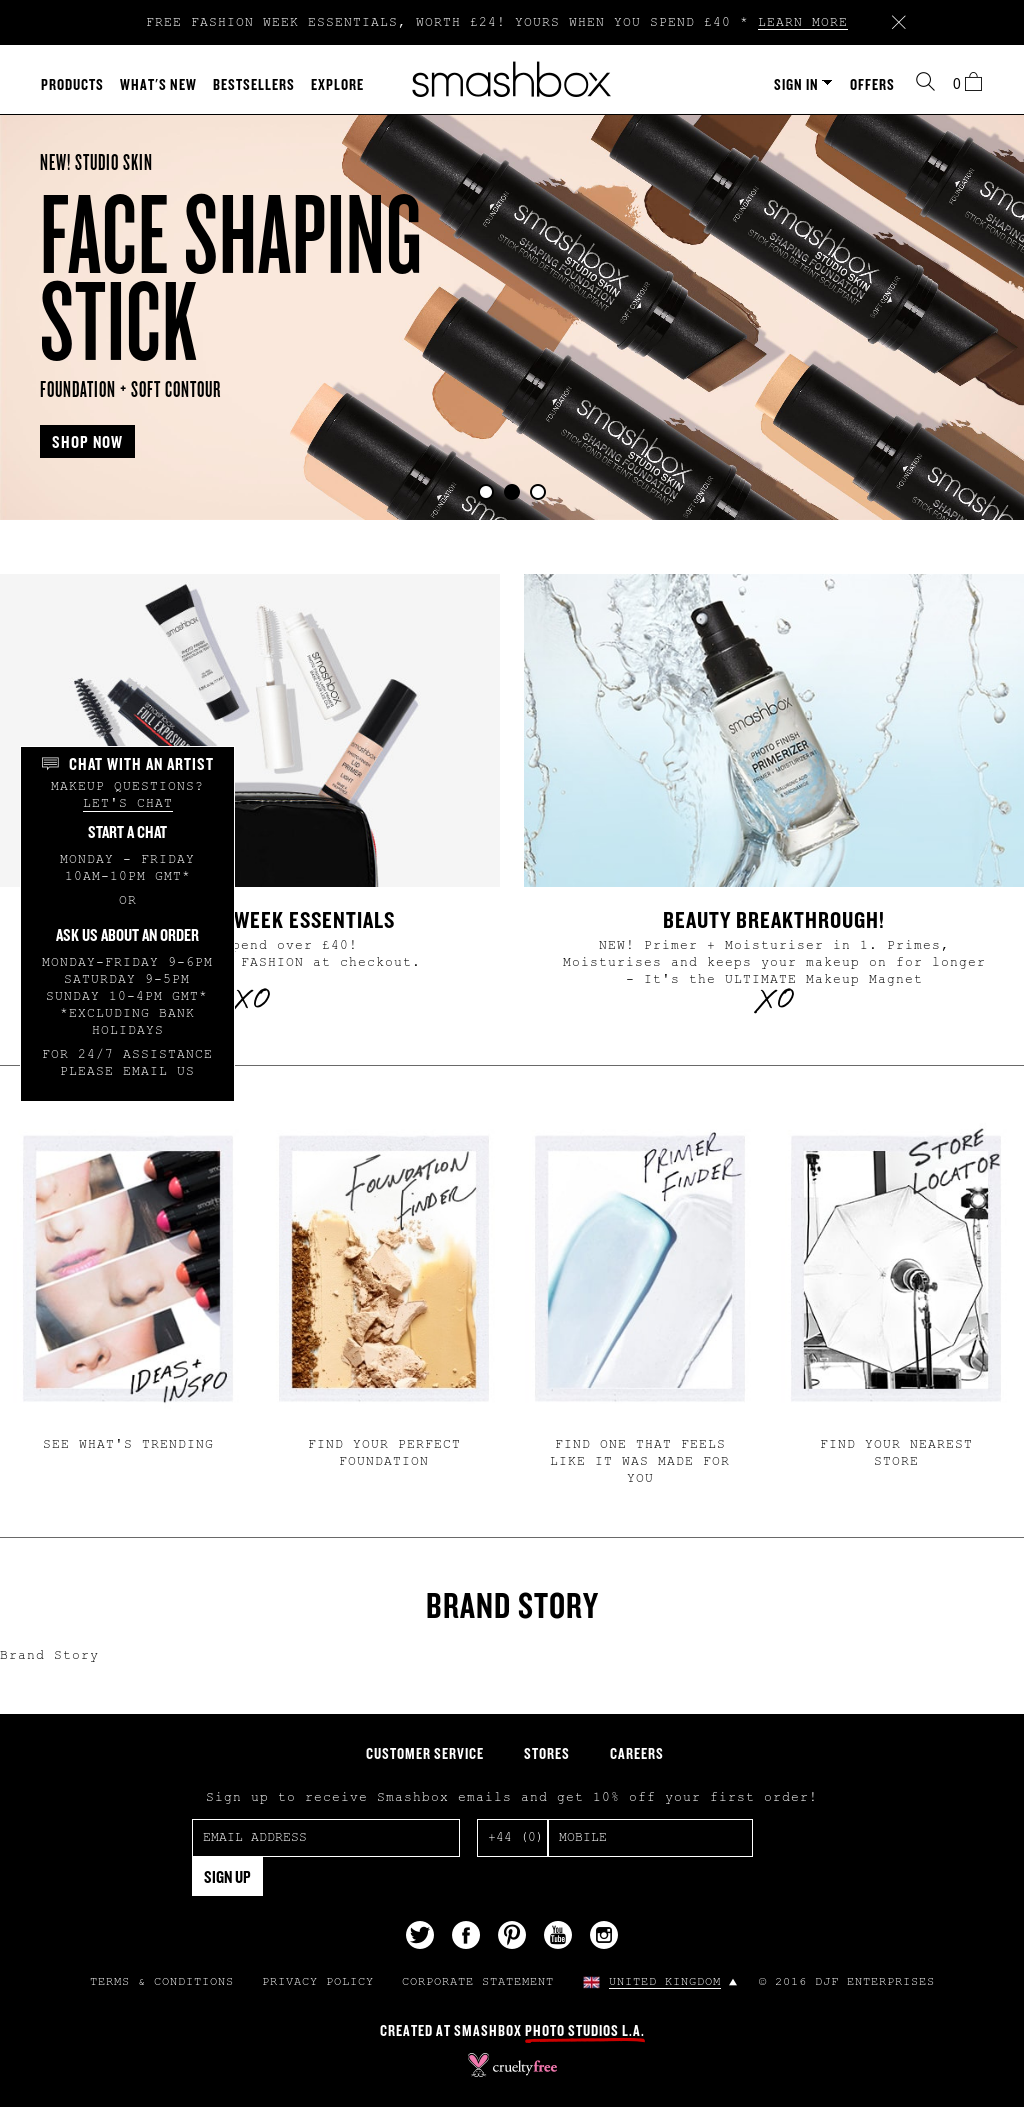 Smashbox Cosmetics Uk Competitors, Revenue and Employees - Owler